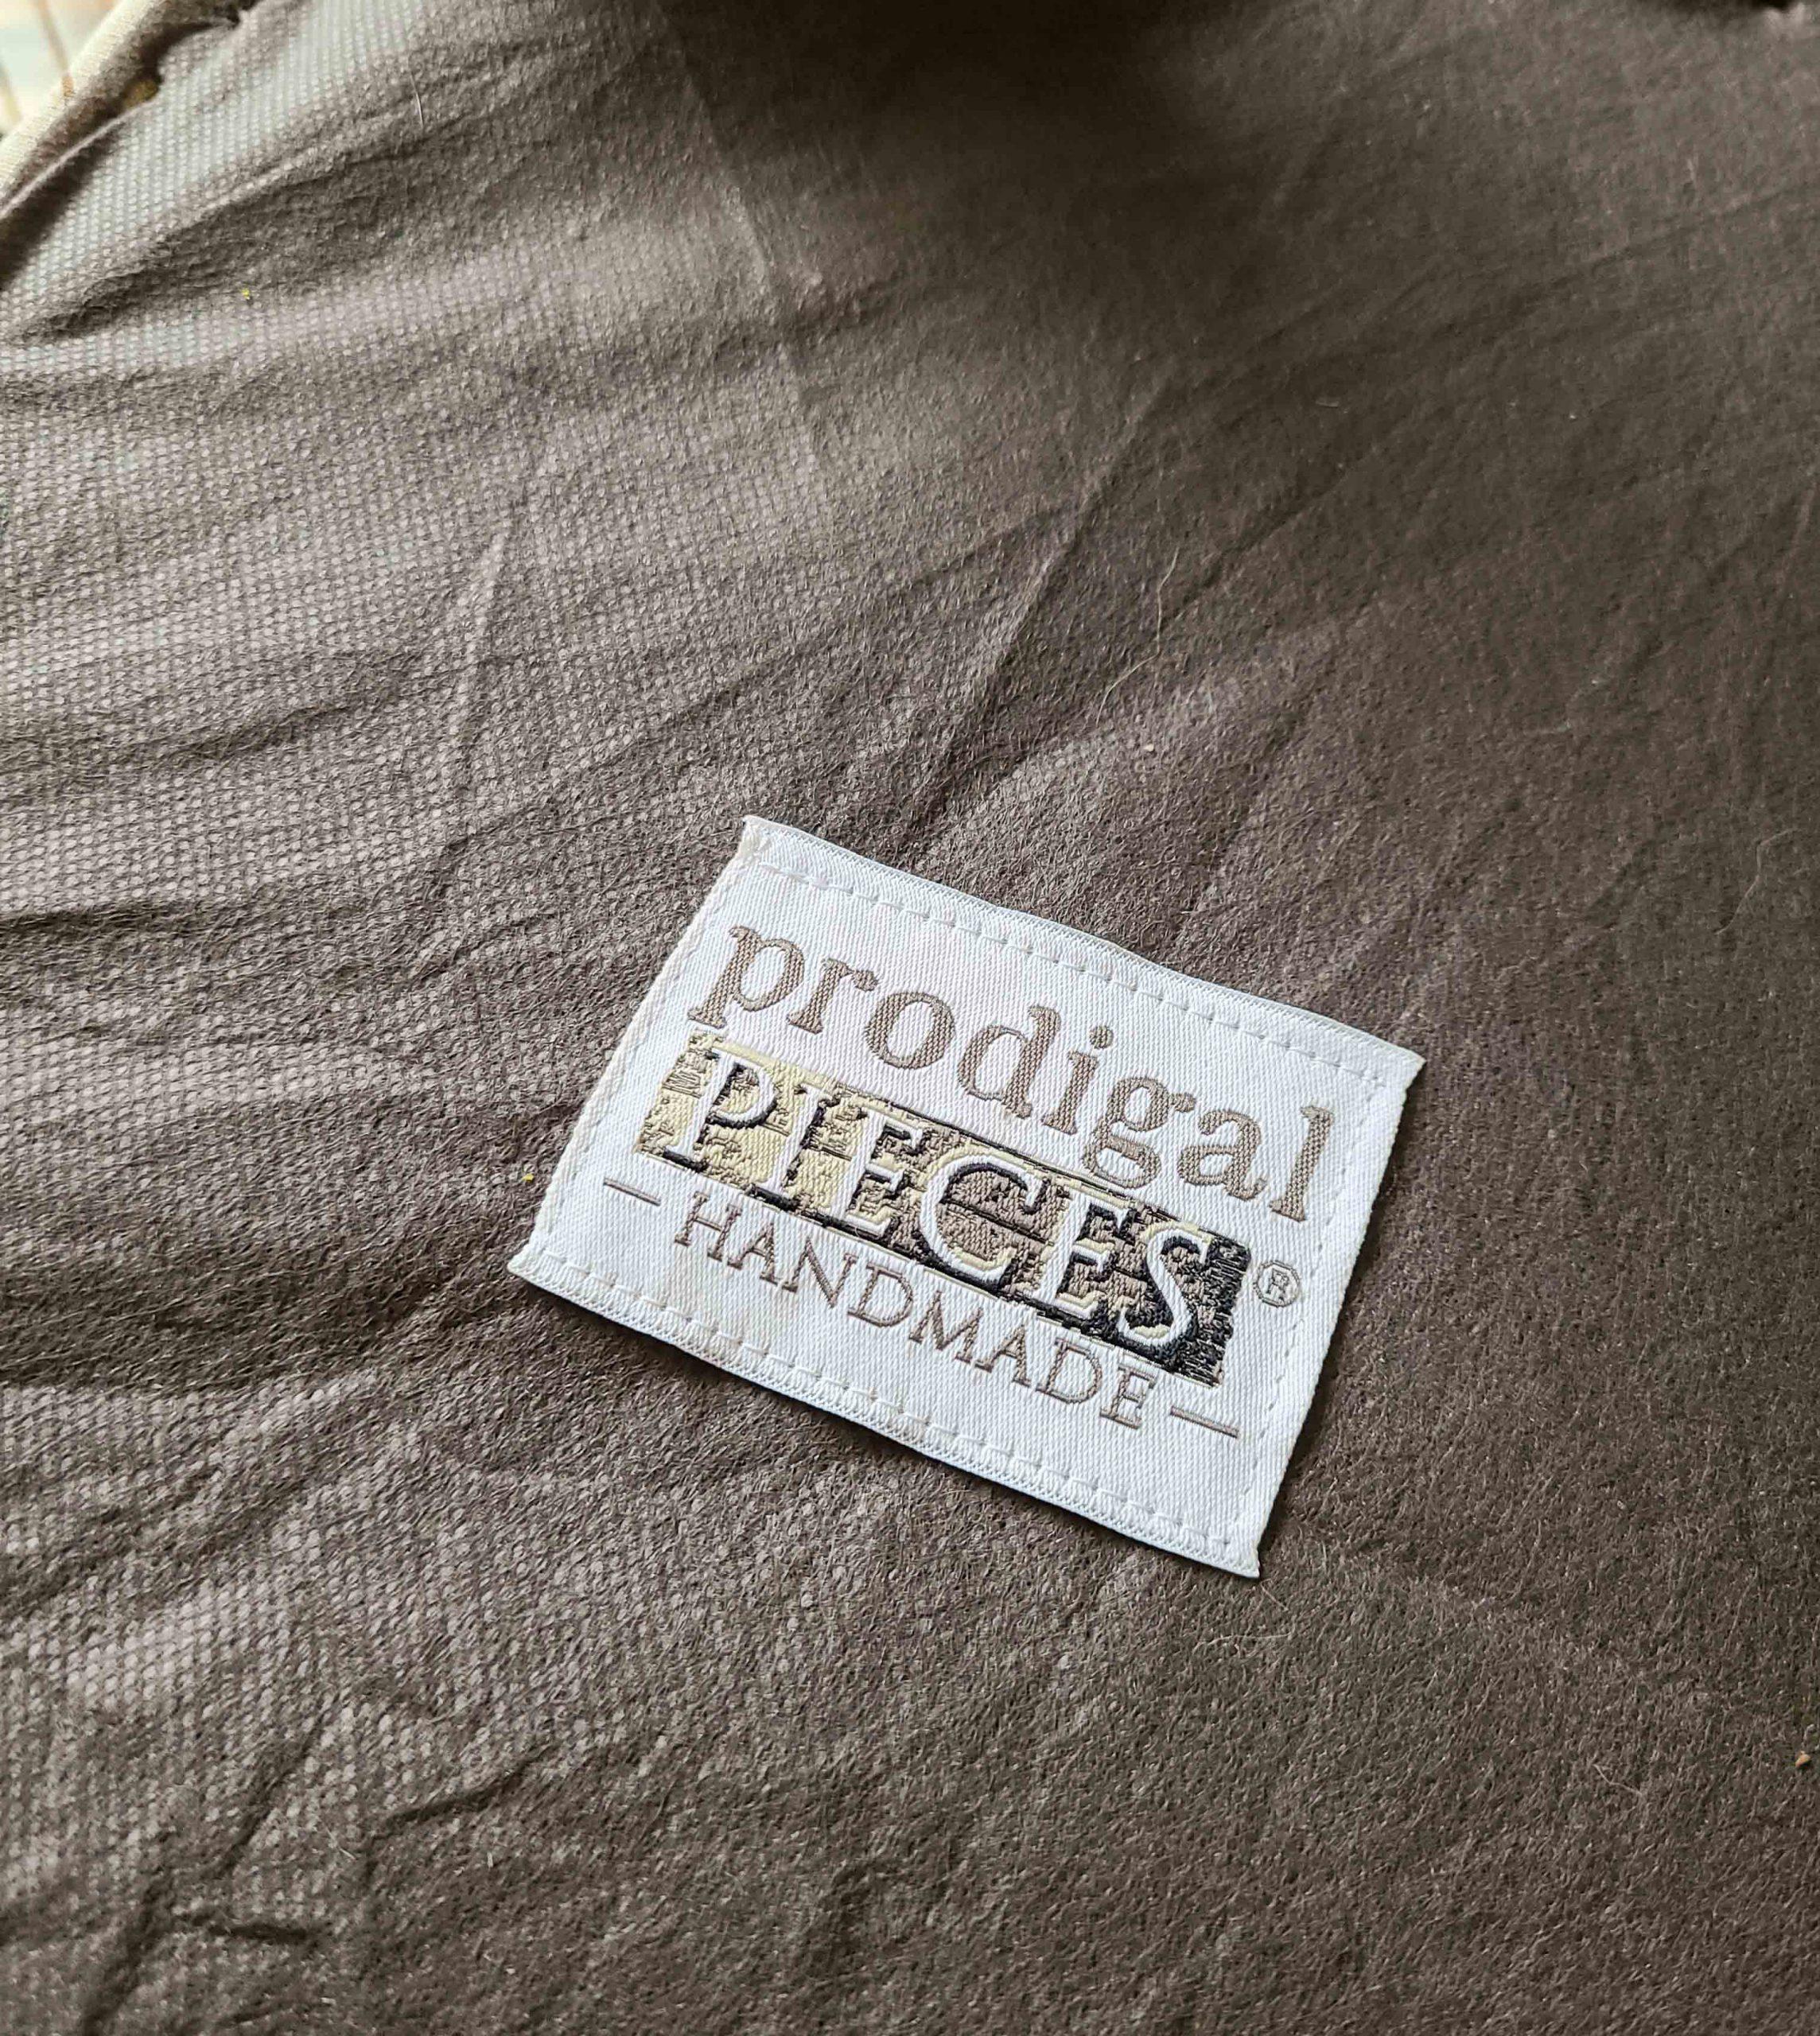 Prodigal Pieces Handmade | prodigalpieces.com #prodigalpieces